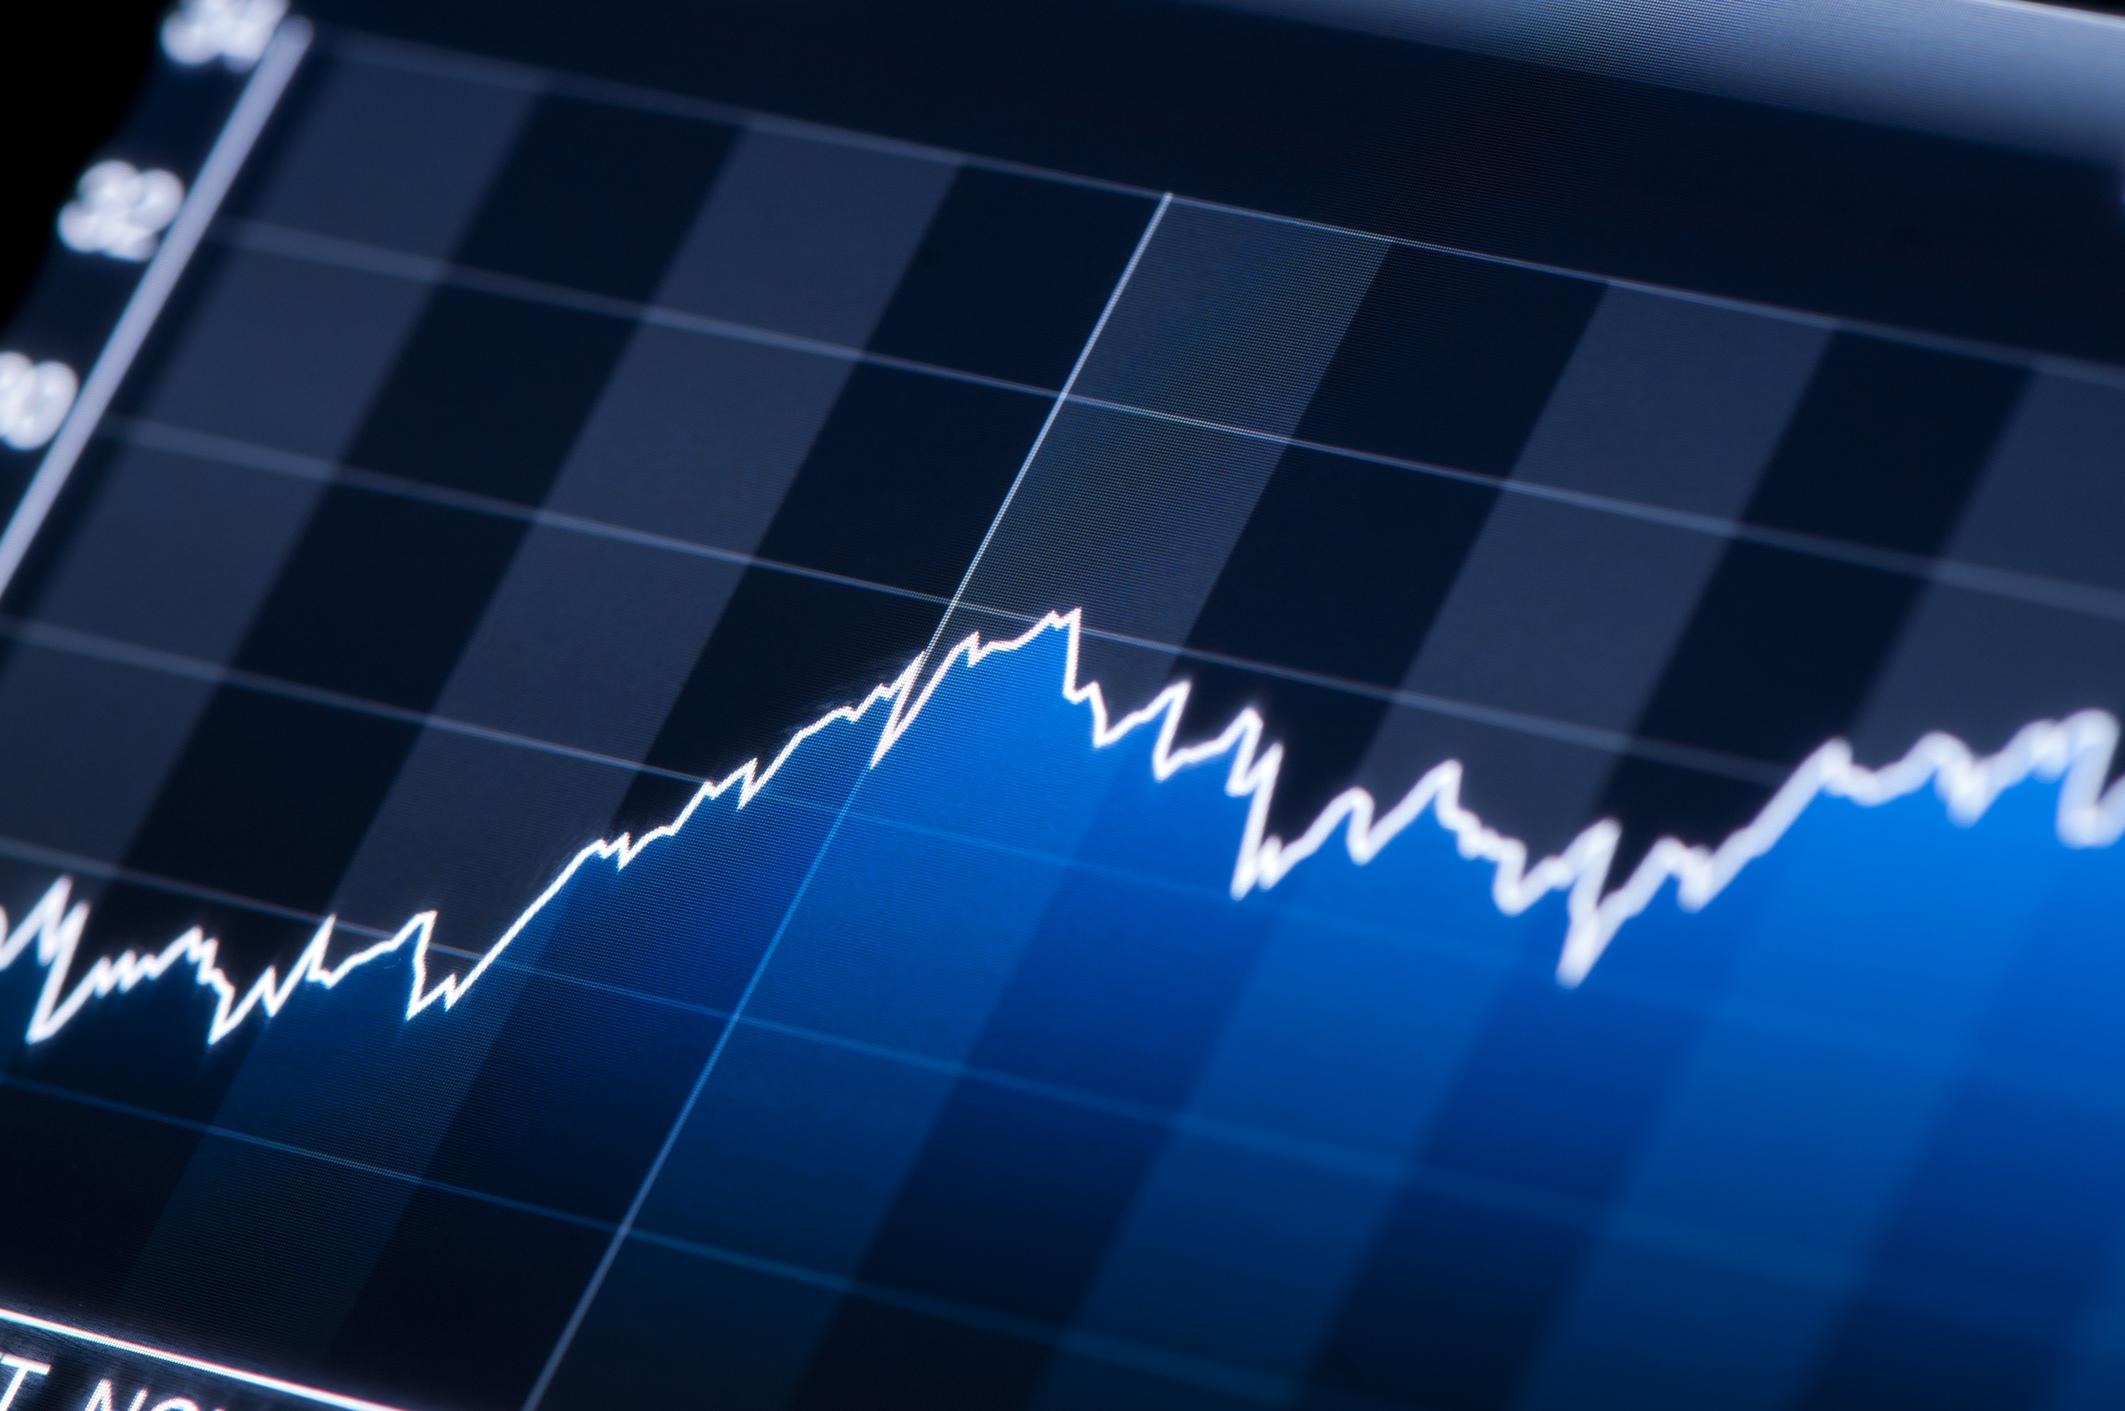 Stock chart with upward trajectory.